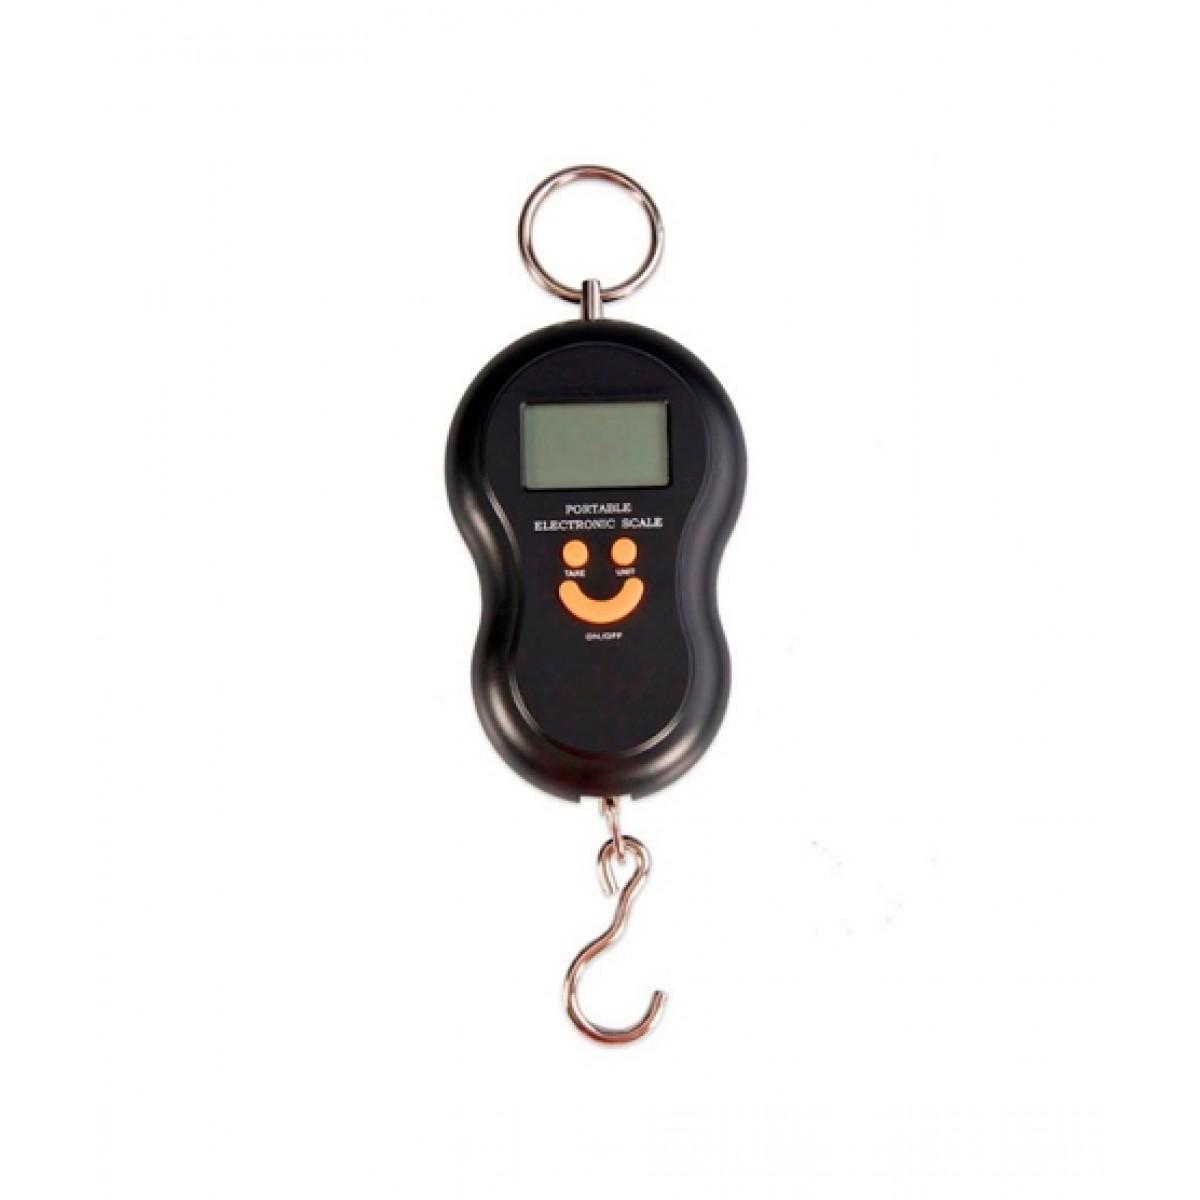 Cool Boy Mart Portable Electronic Luggage Scale